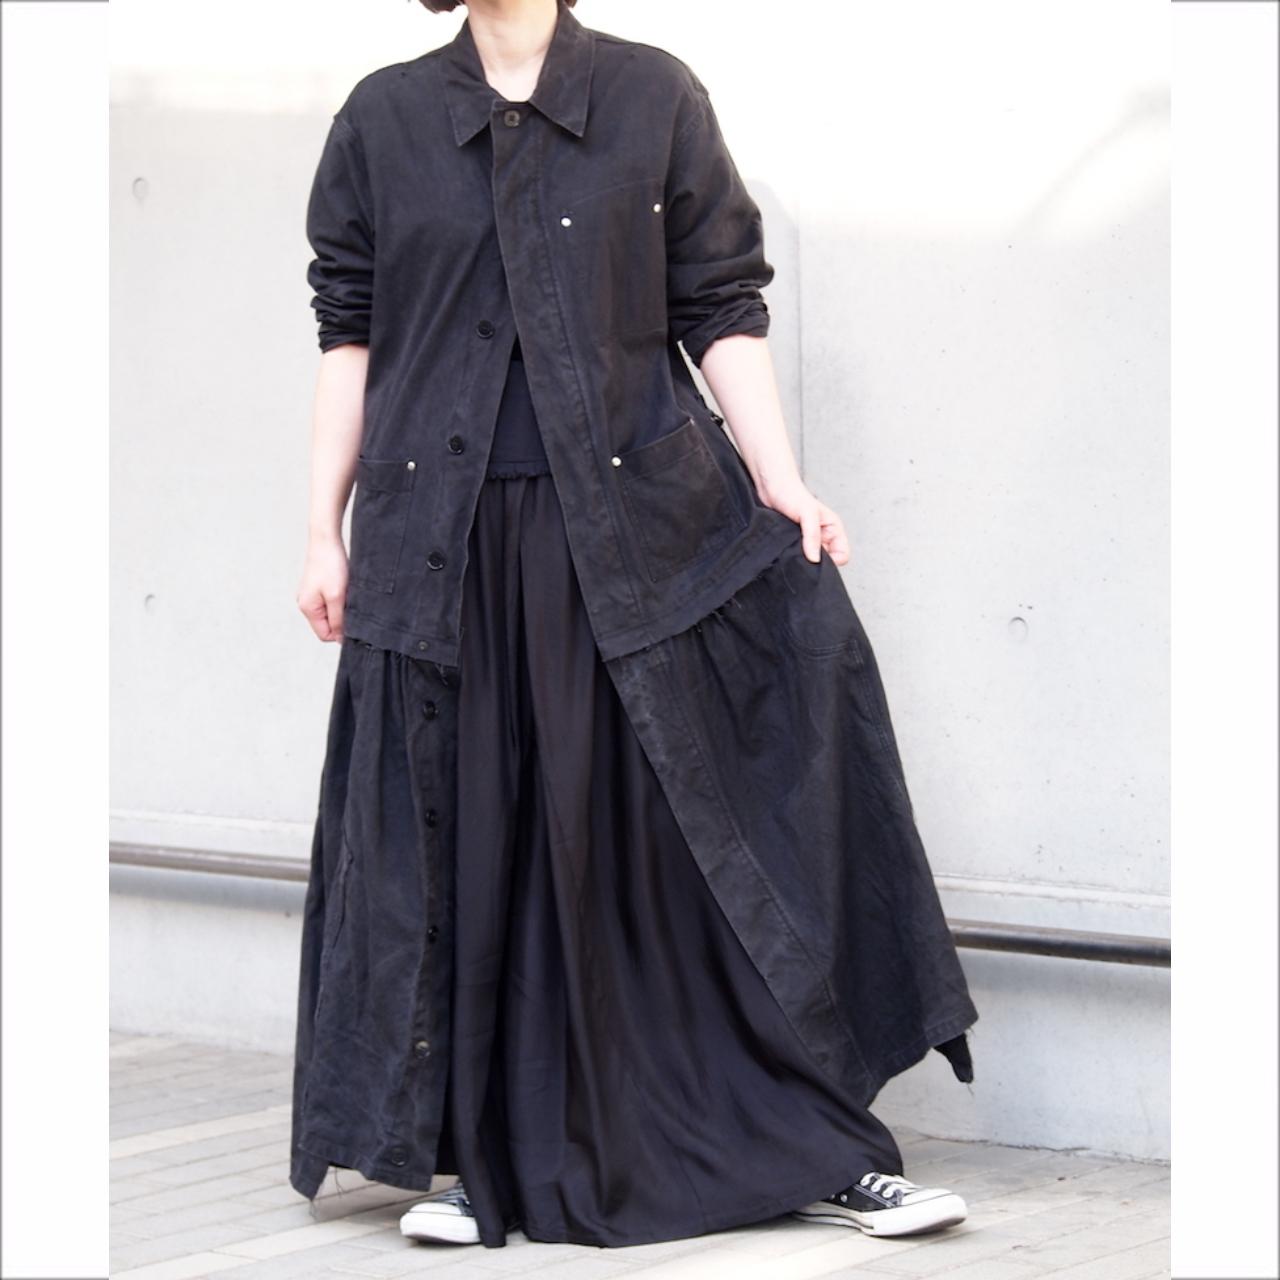 【sandglass】east german one-piece coat / 【サンドグラス】イースト ジャーマン ワンピース コート